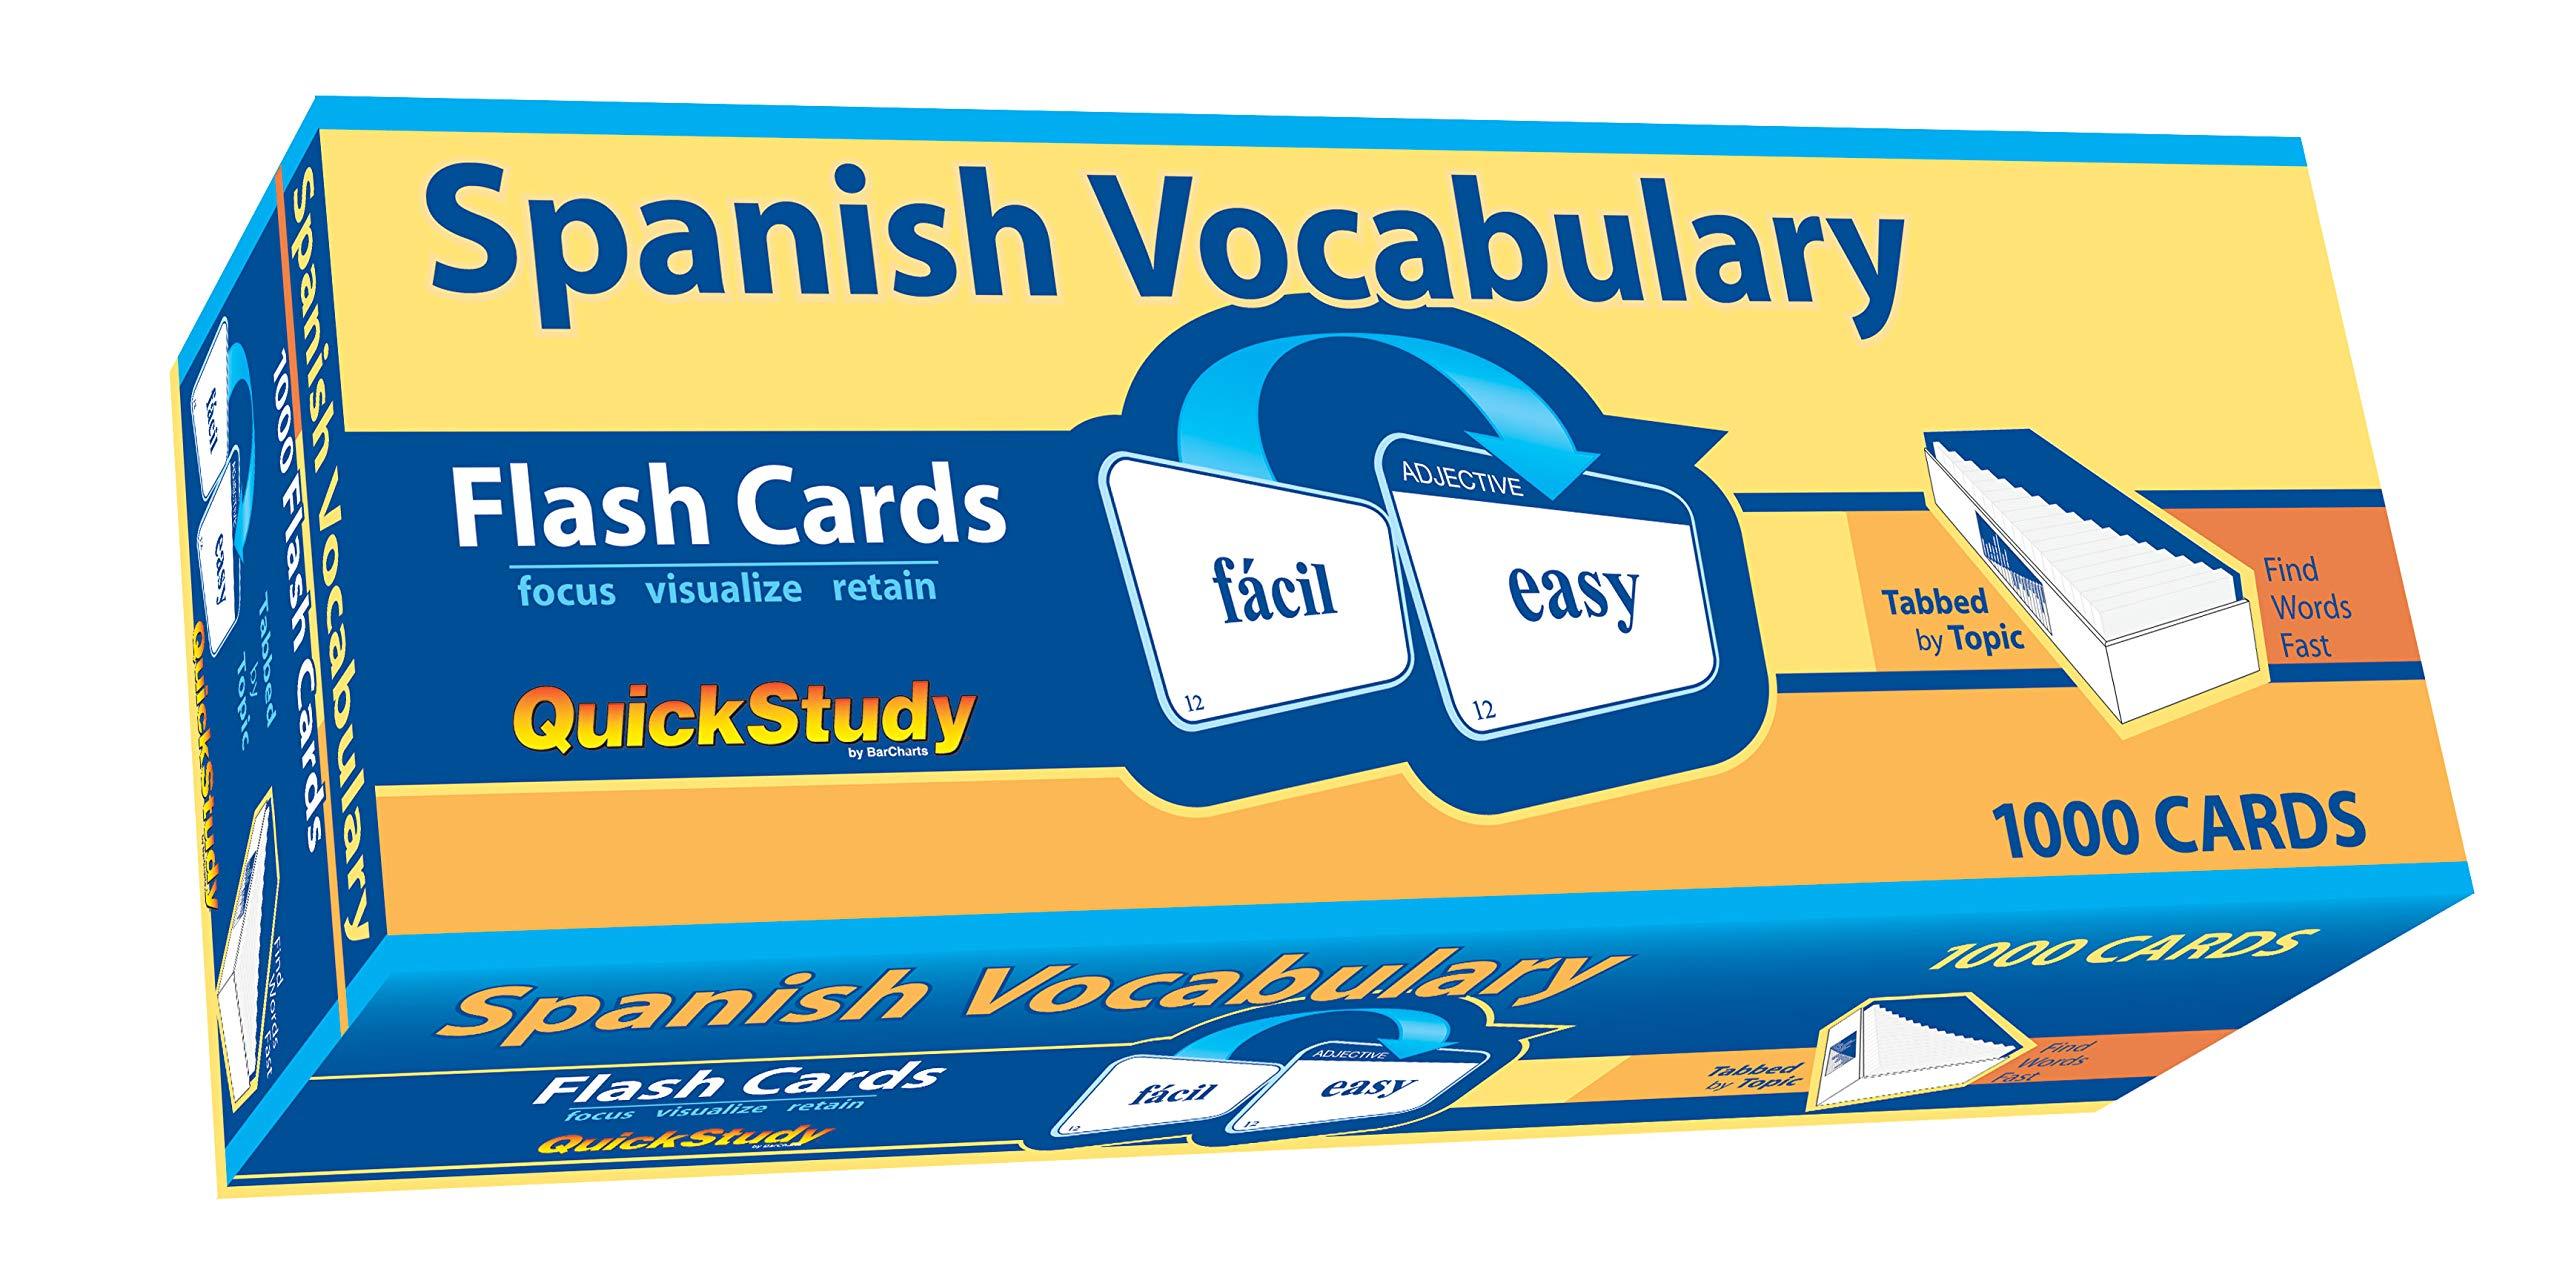 Spanish Vocabulary Flash Cards (Quickstudy (Flash Cards